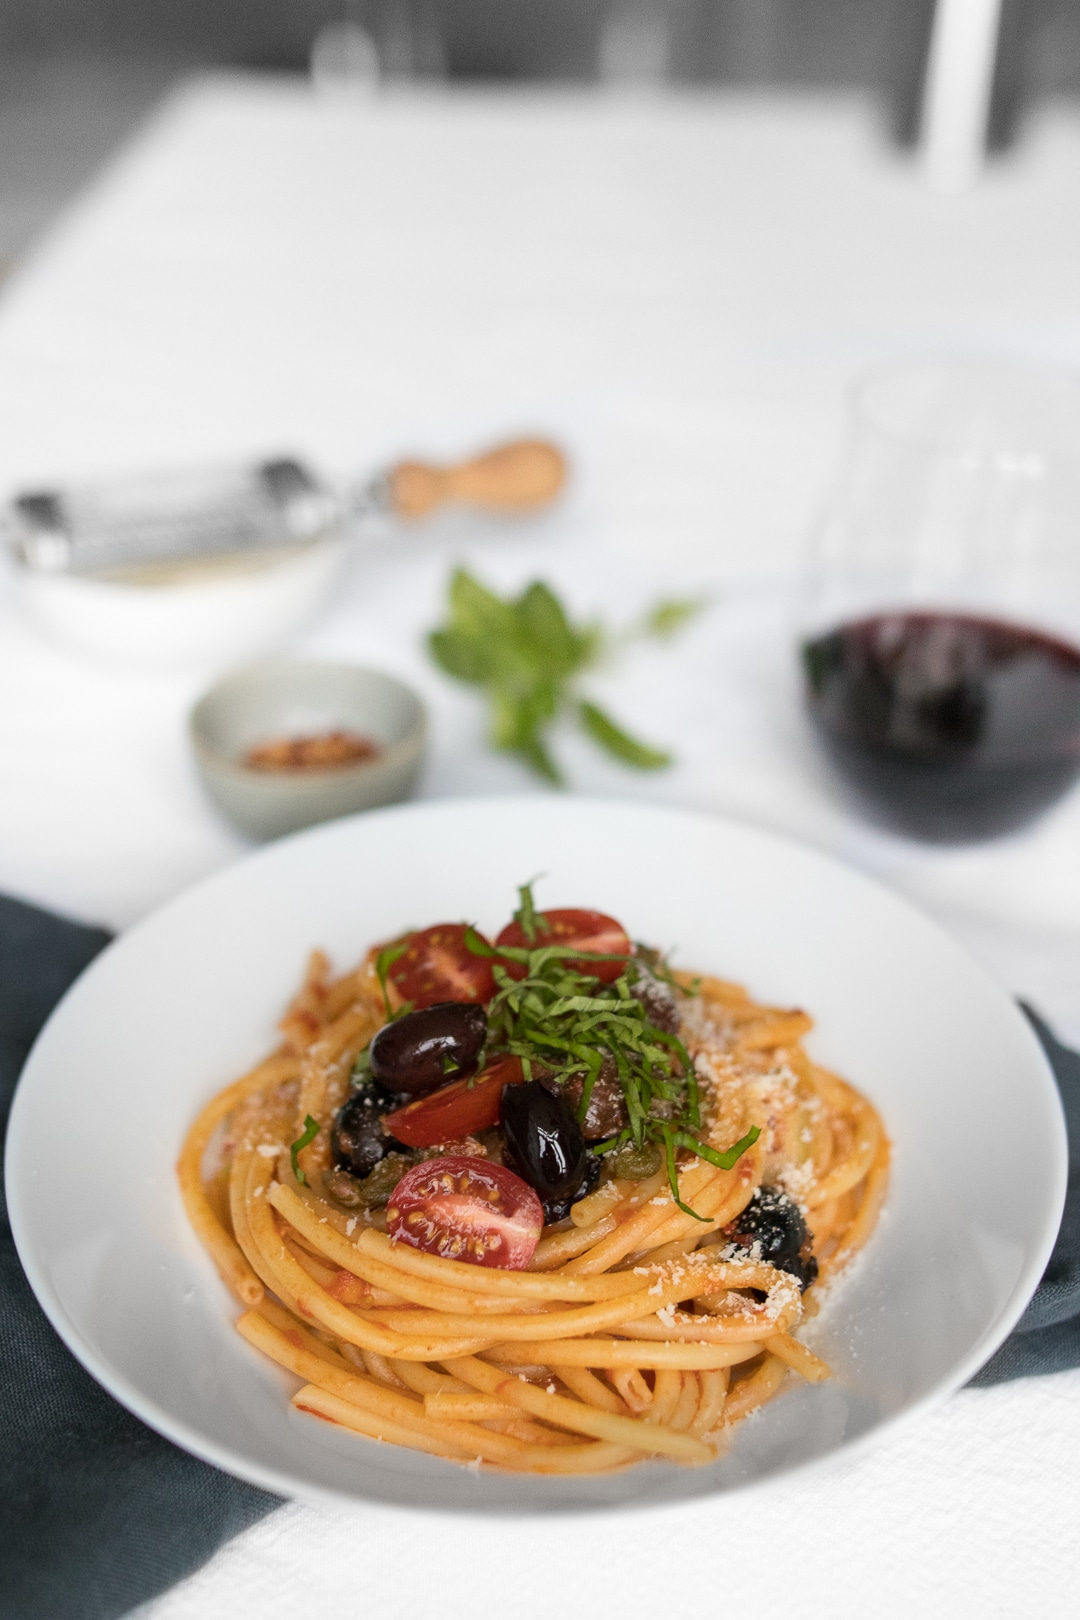 Spaghetti Puttanesca next to a glass of red wine